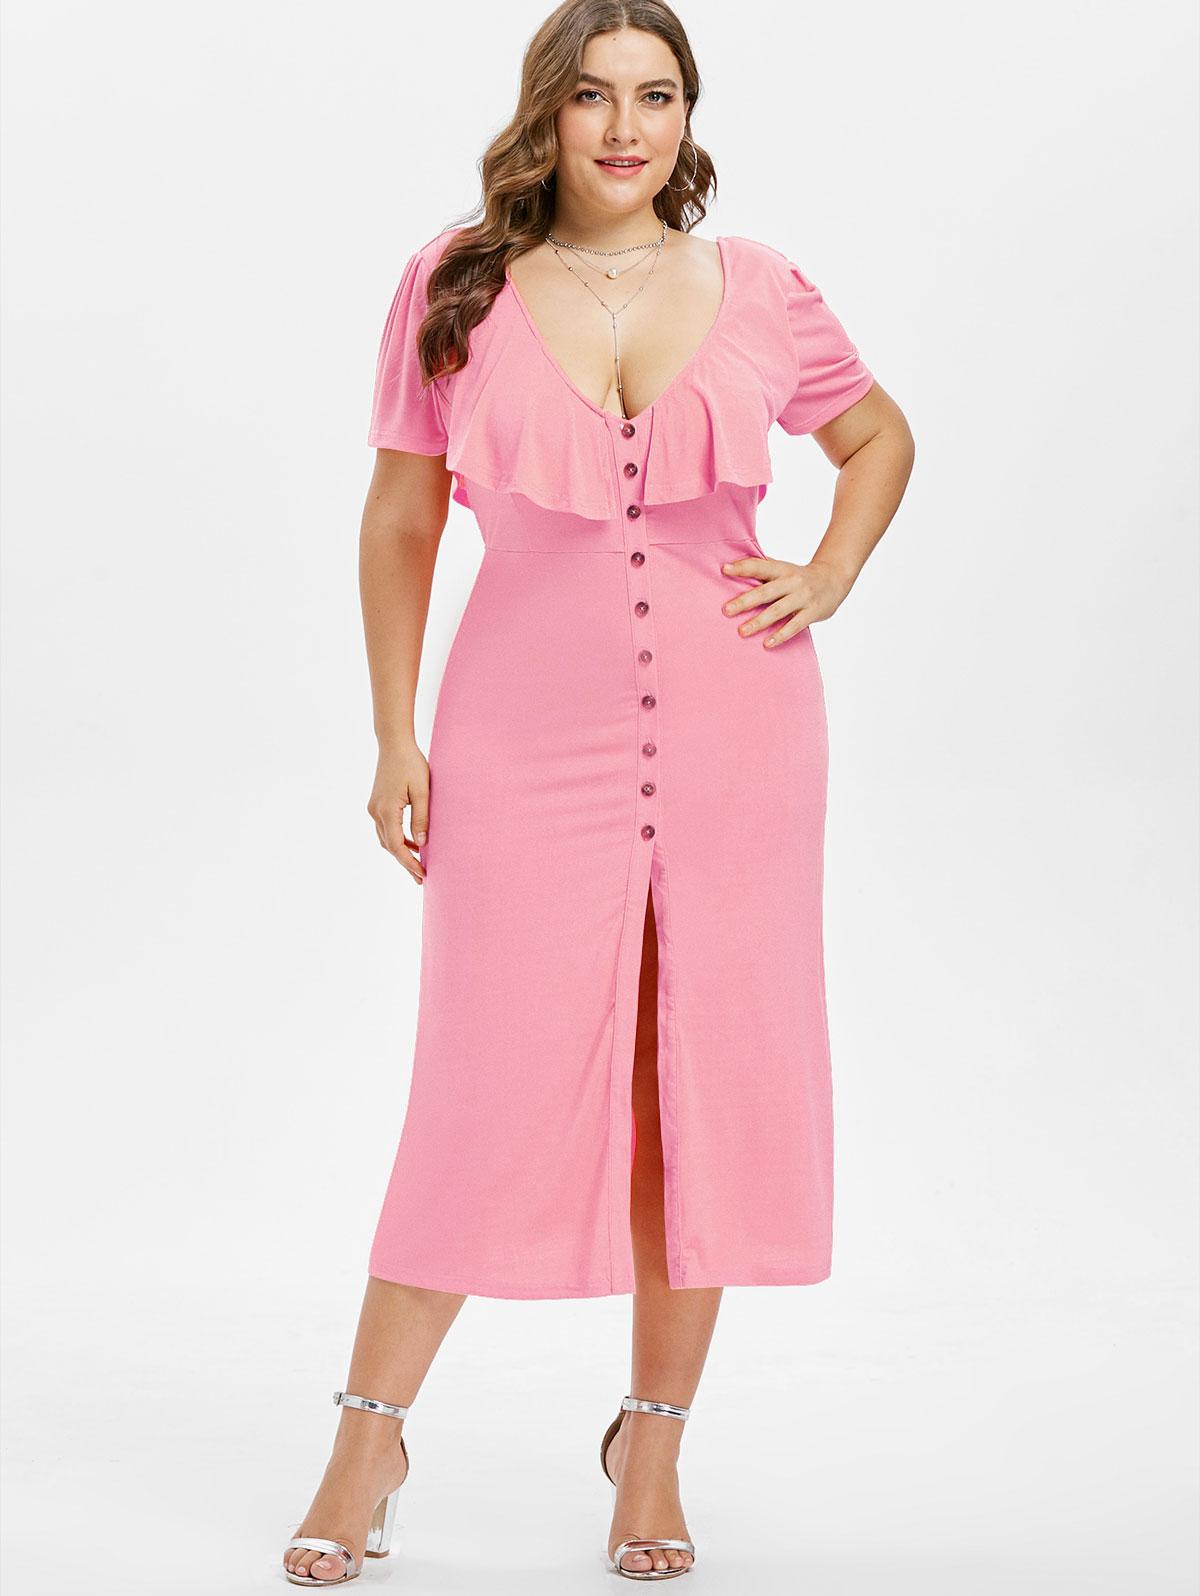 013bc52b7f Wipalo Elegant Casual Front Slit Short Sleeve Women Dresses Plus Size V  Neck Ruffle Criss Cross Button Dress High Waist Dress Dressing Style For  Women ...